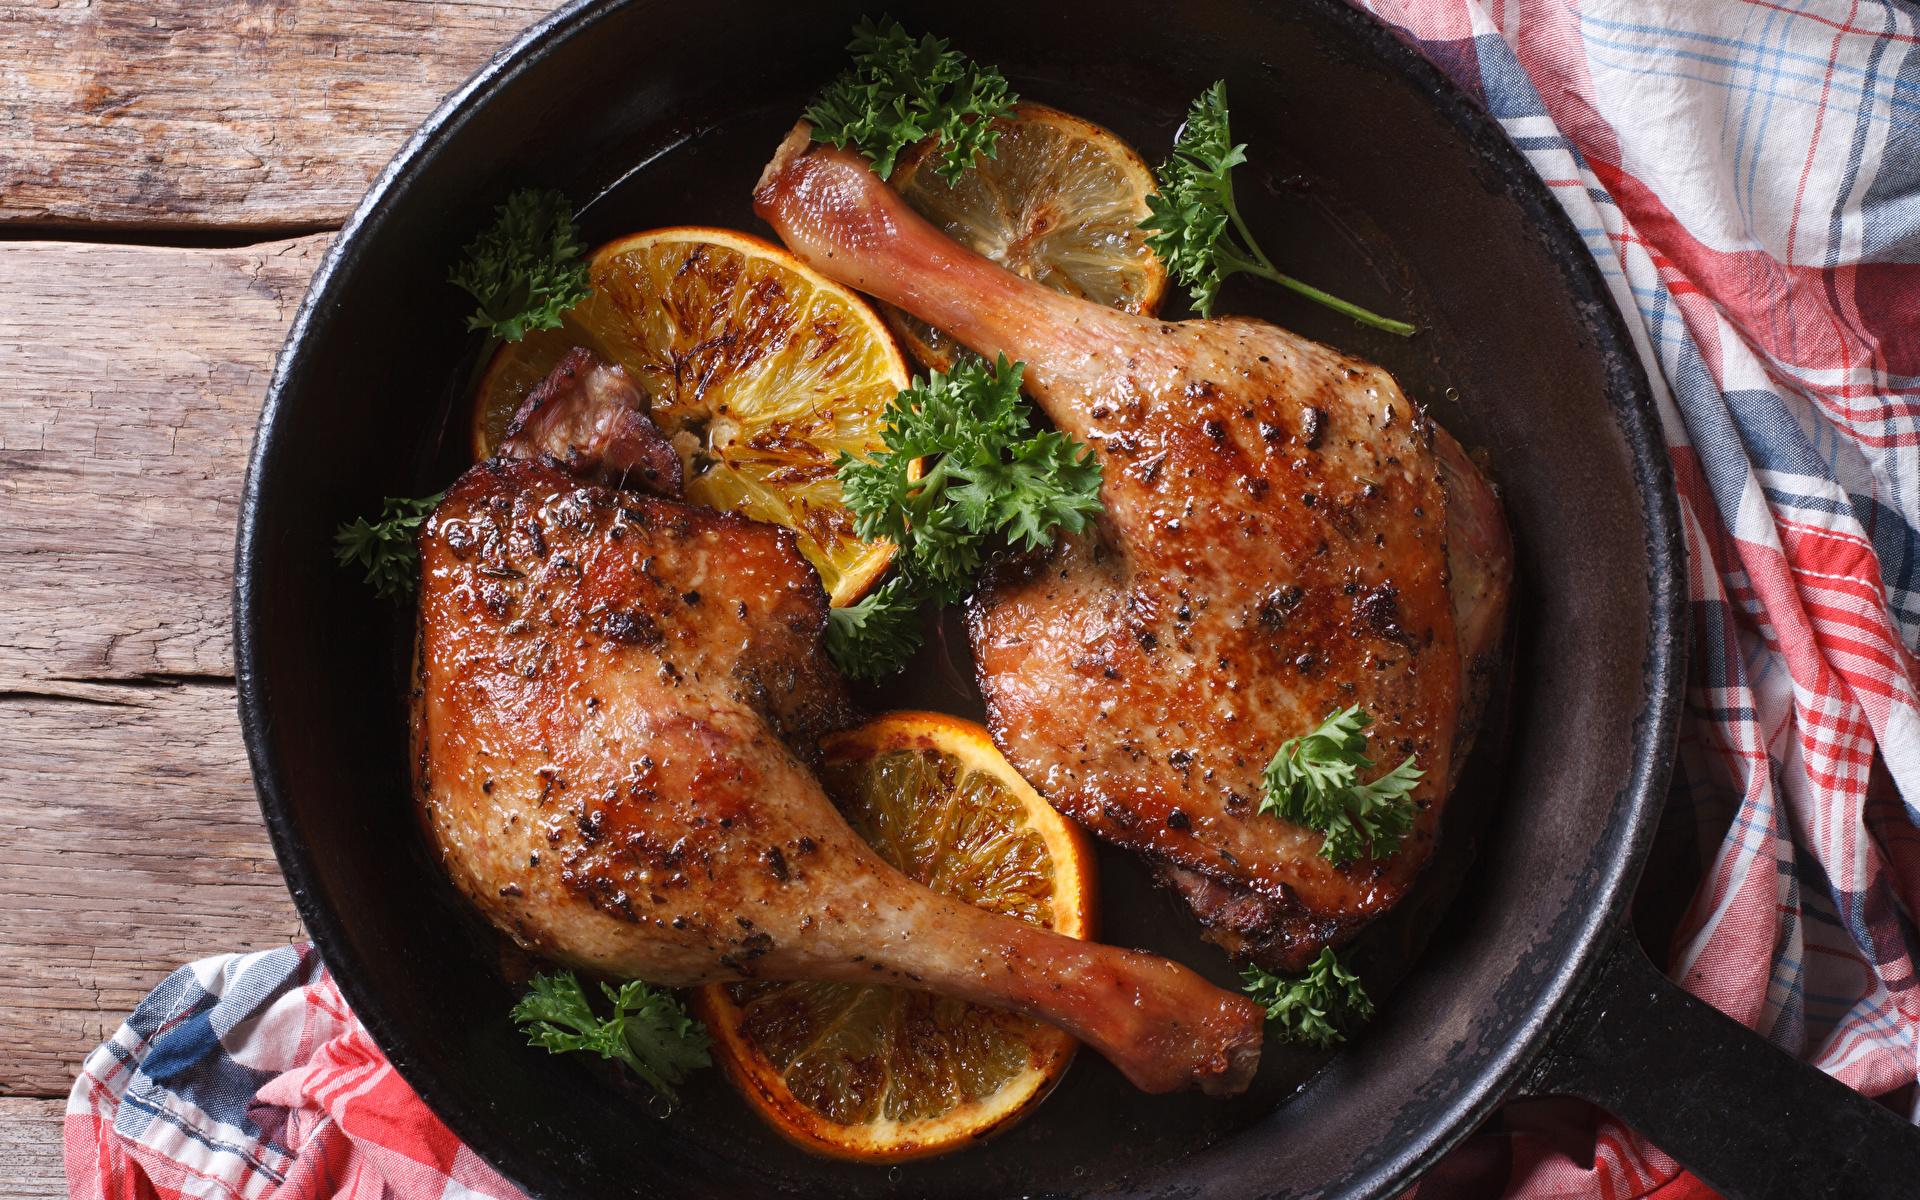 Images Orange fruit Frying pan Roast Chicken Food 1920x1200 frypan